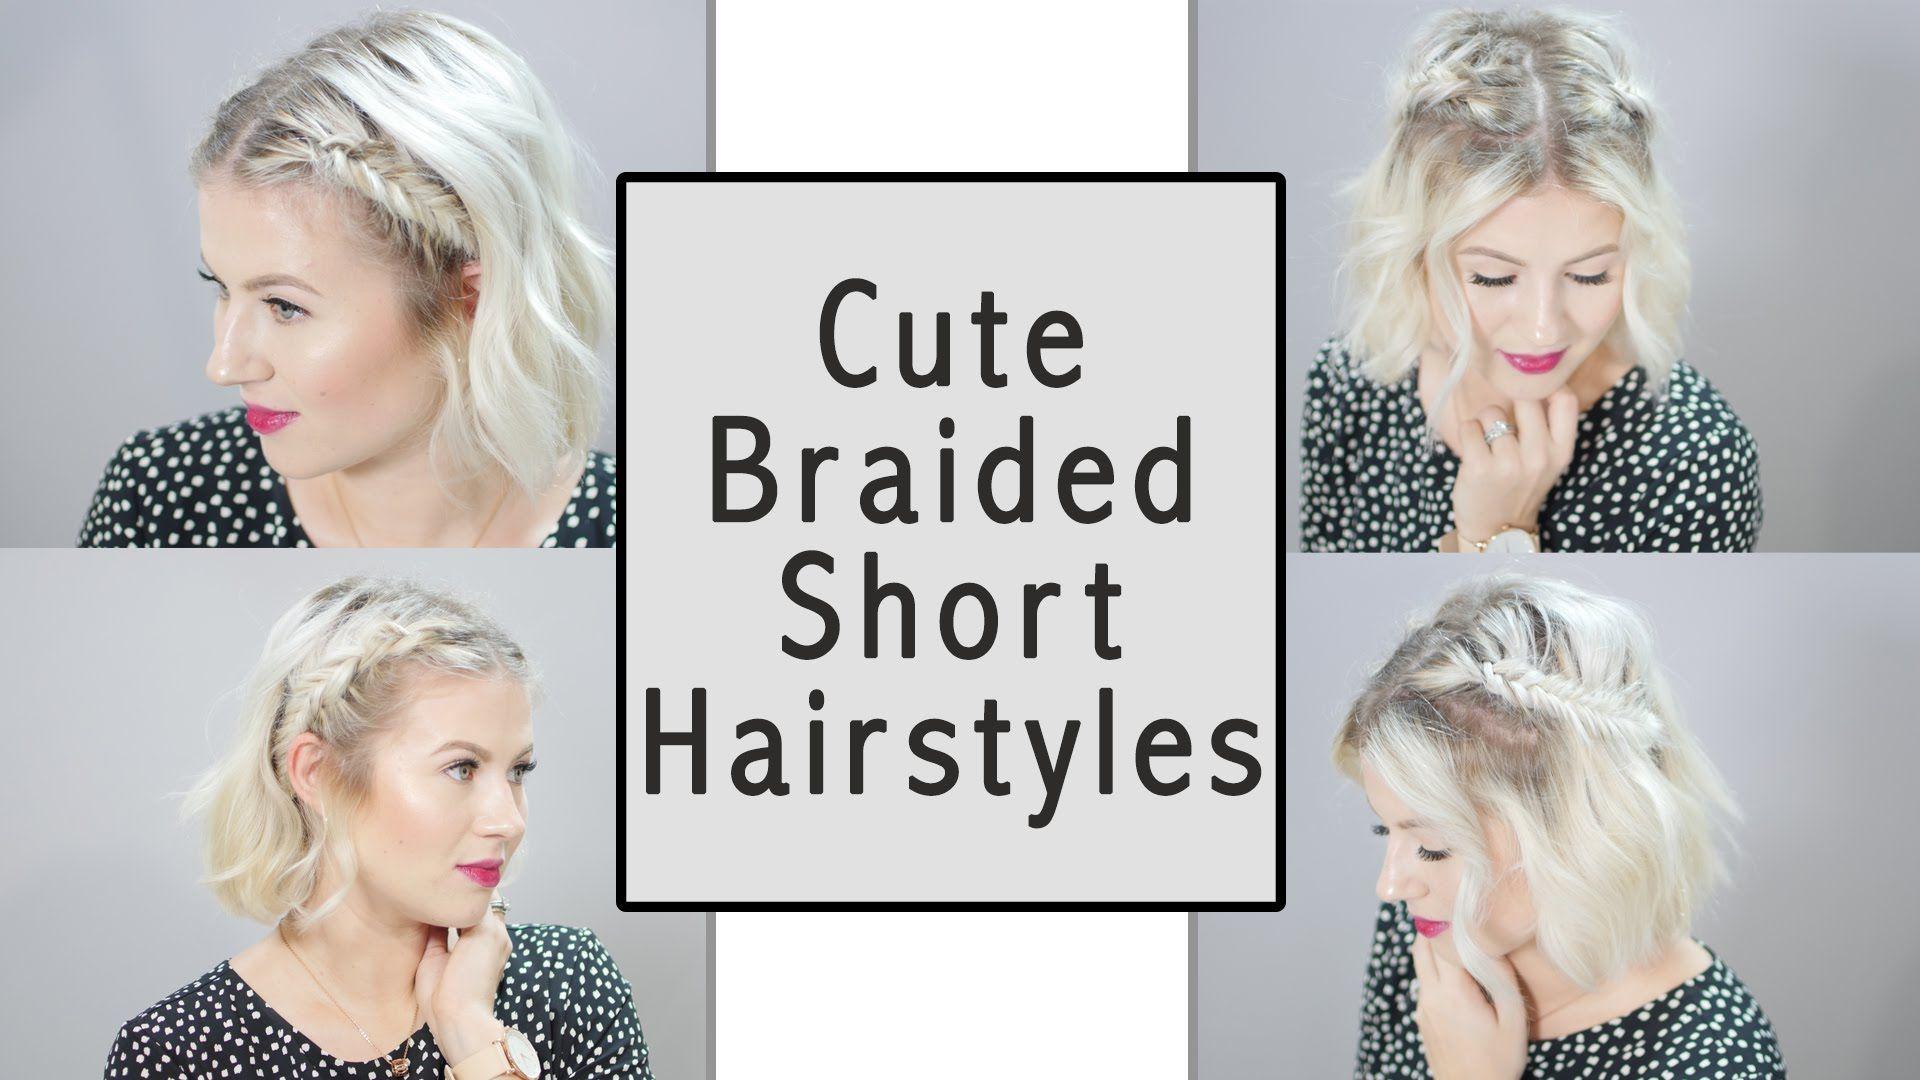 Short hair hairstyles youtube - Cute Braided Short Hairstyles Milabu